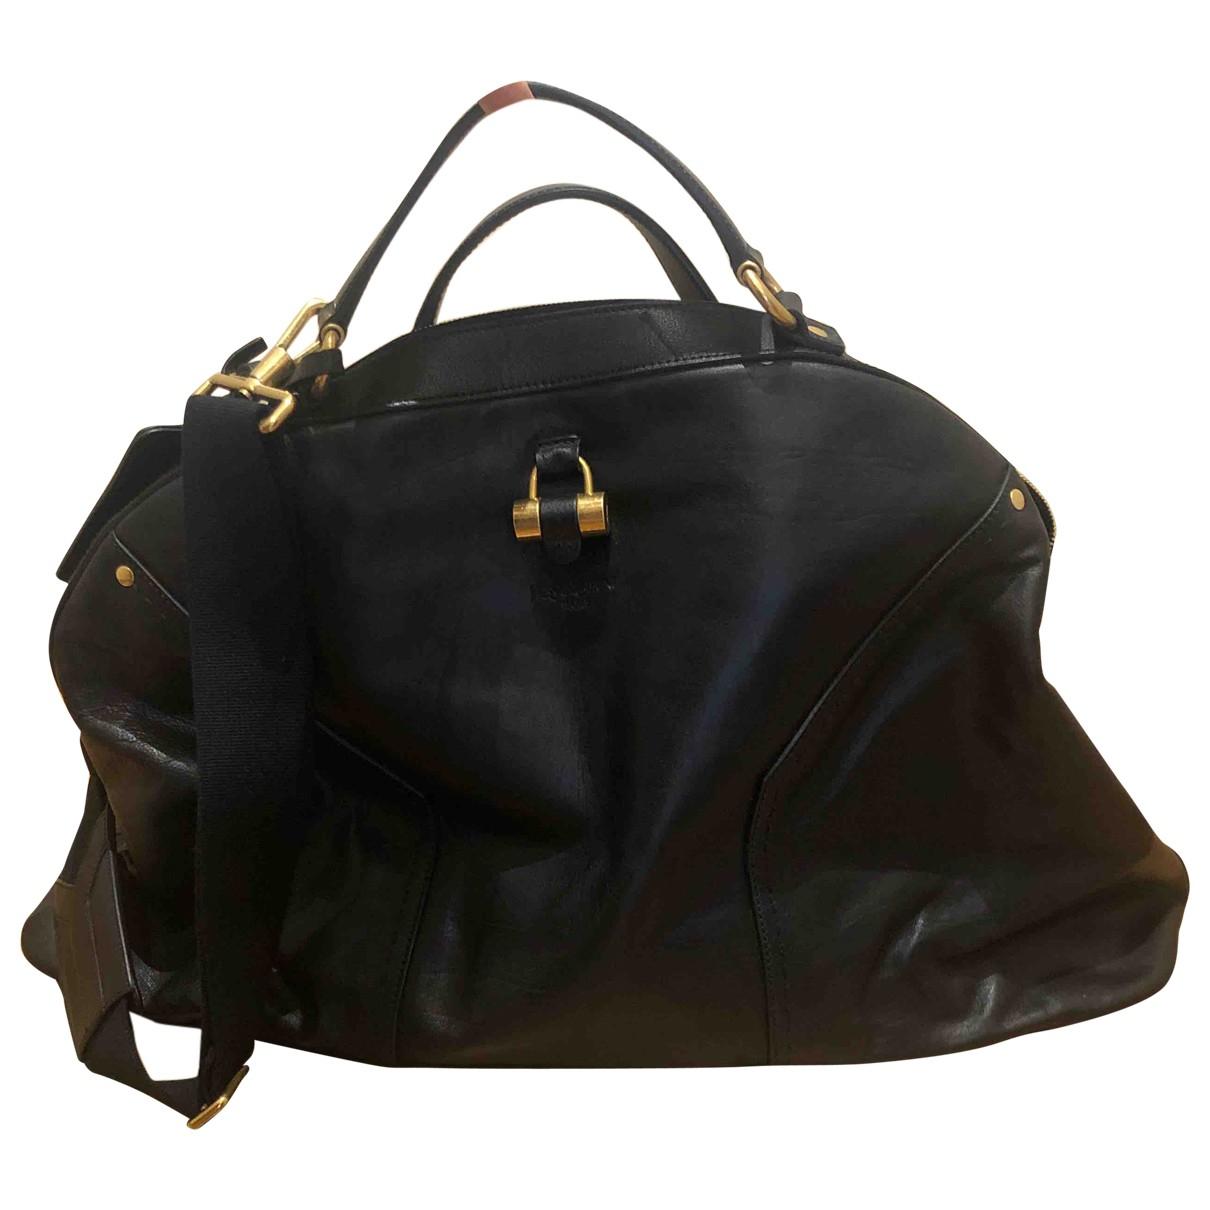 Yves Saint Laurent \N Black Leather bag for Men \N